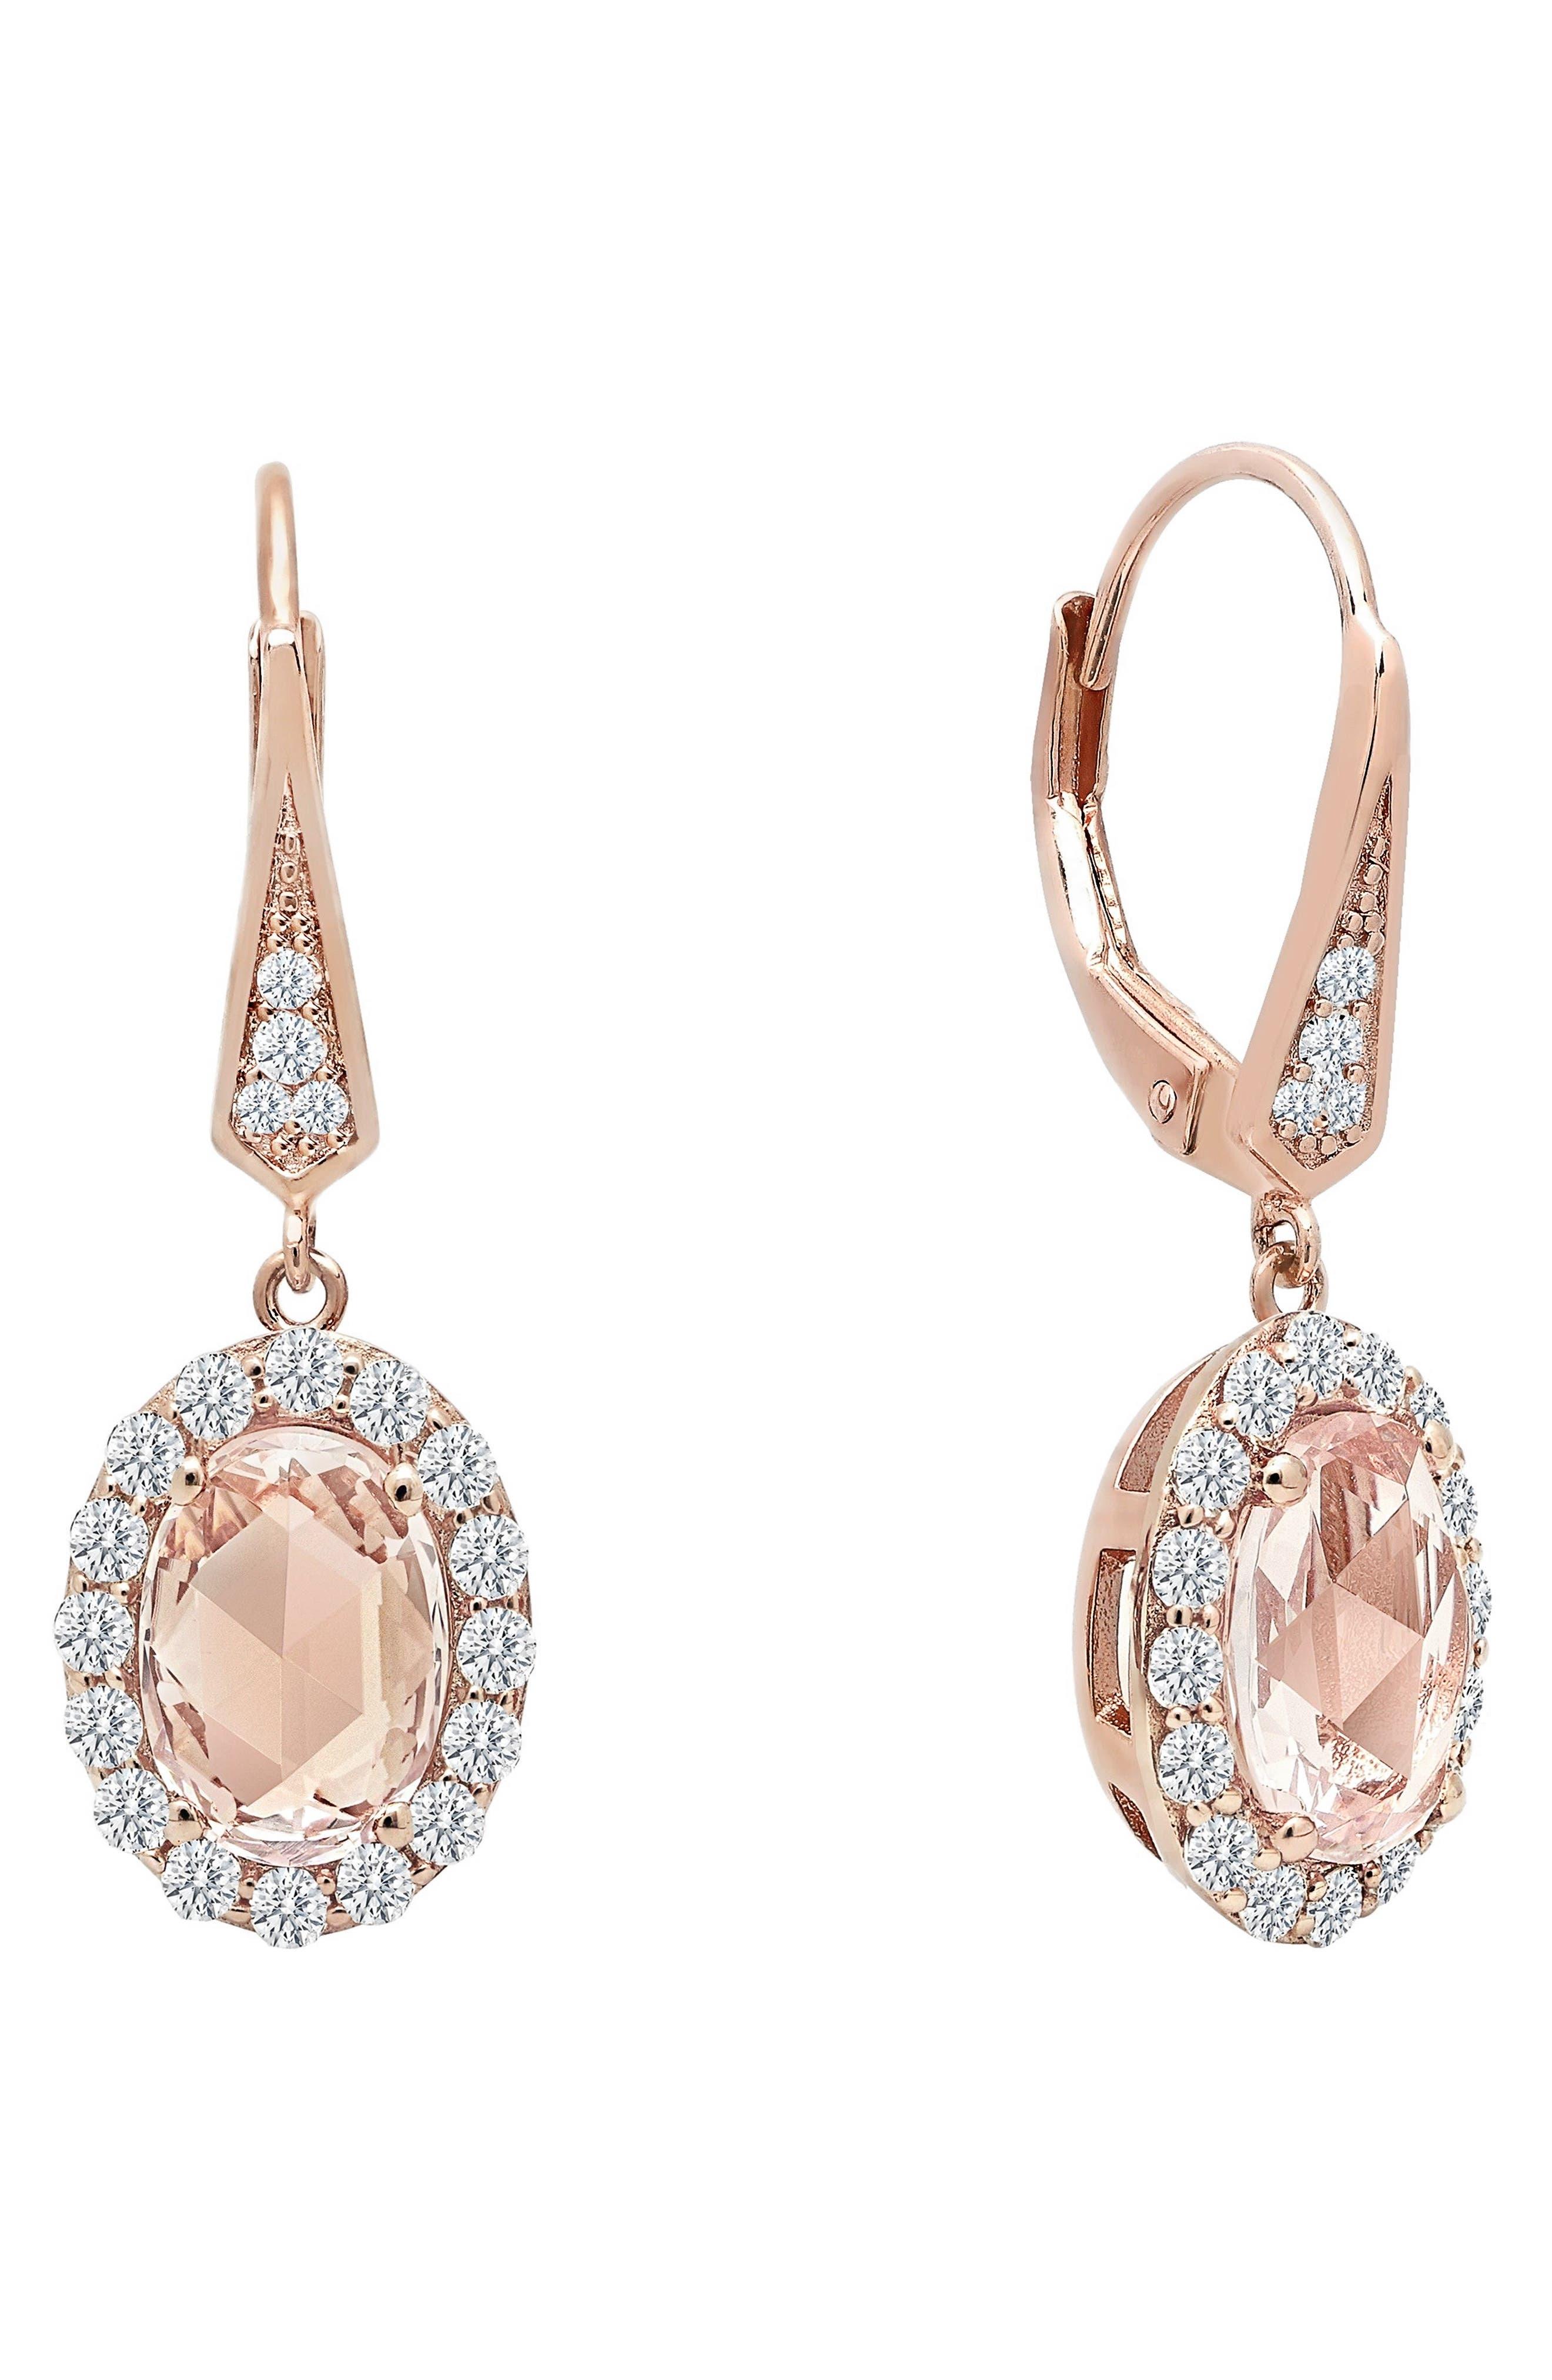 Simulated Diamond Drop Earrings,                         Main,                         color, PINK / ROSE GOLD